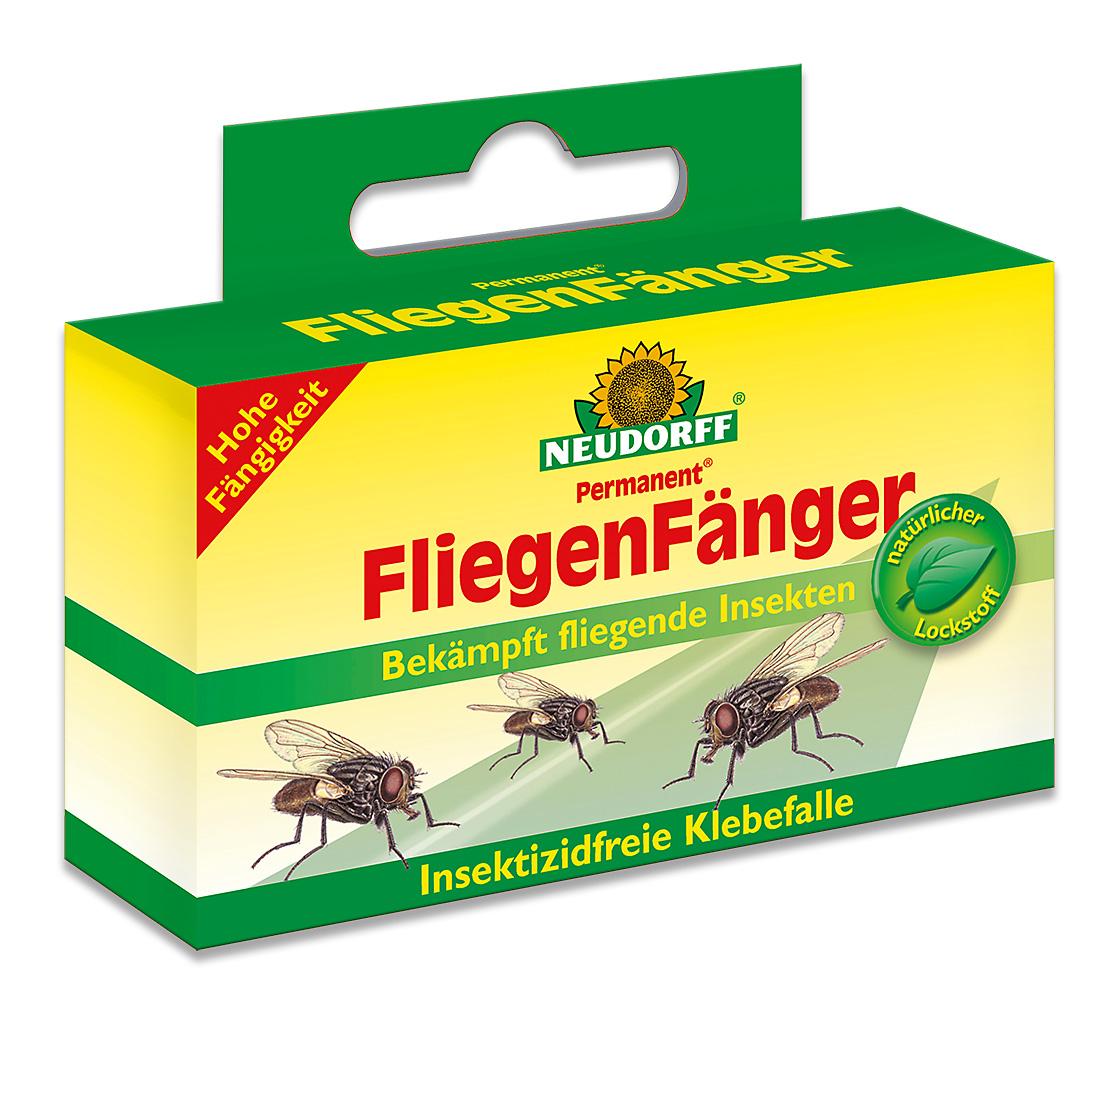 neudorff permanent fliegenf nger fliegenstreifen insekten bek mpfen fliegen bek mpfen. Black Bedroom Furniture Sets. Home Design Ideas